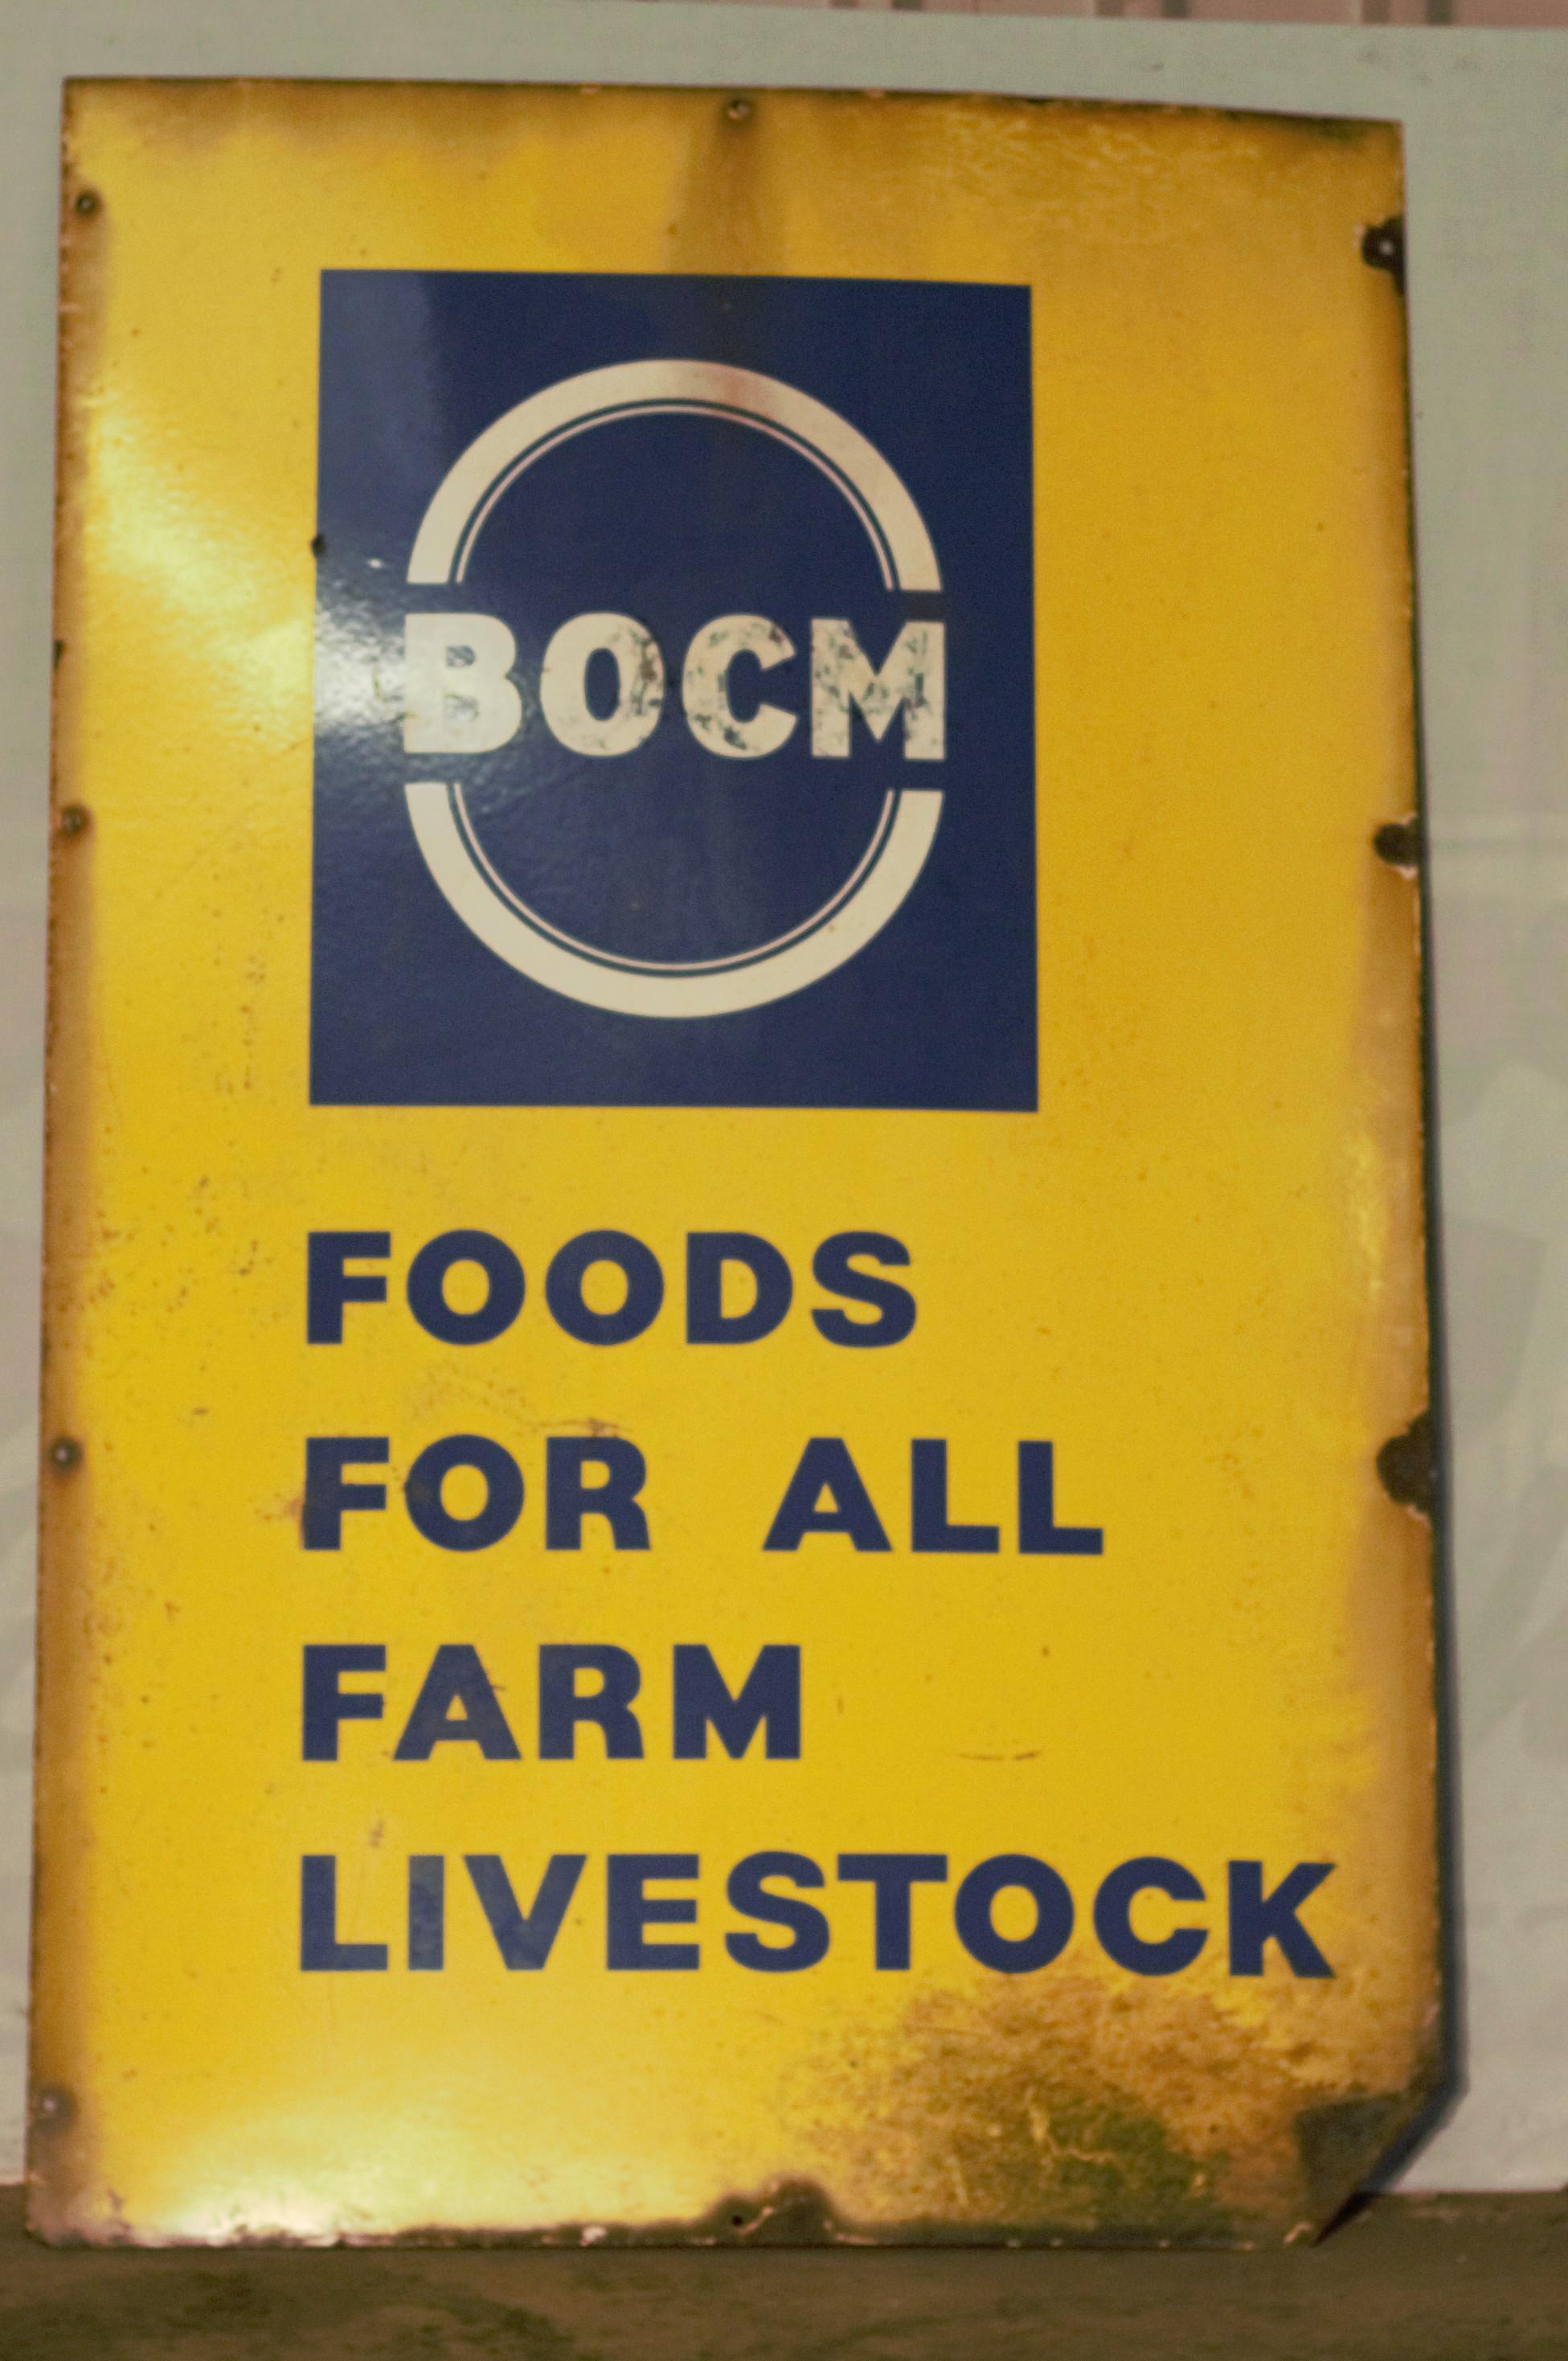 Vintage enamel advertising sign 'BOCM Foods for all farm livestock', 122 x 244cm